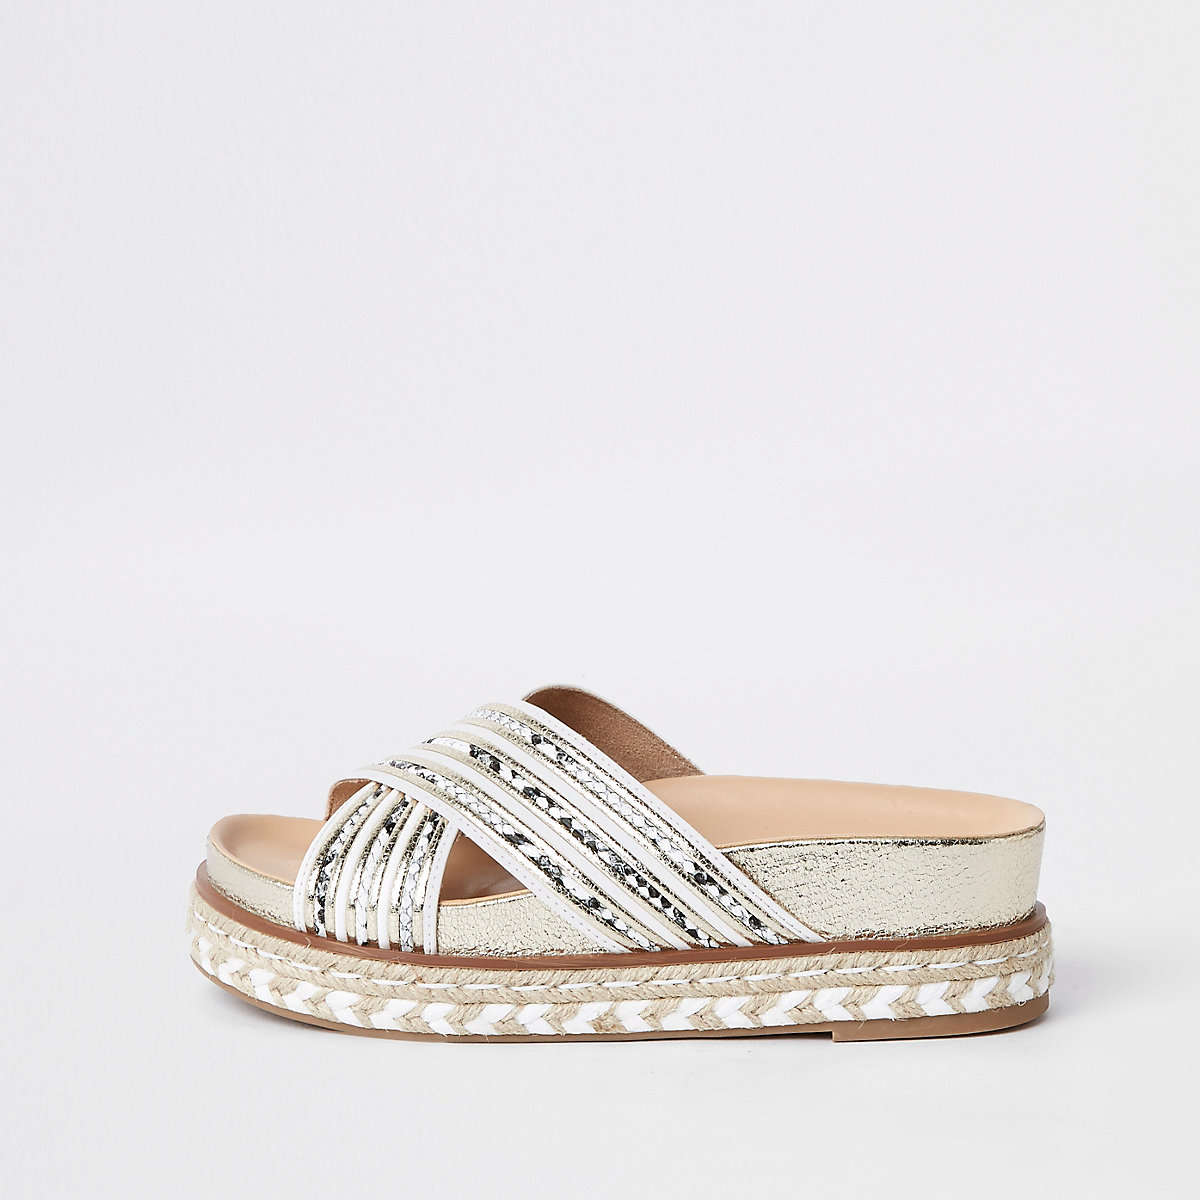 White cross strap espadrille platform sandals